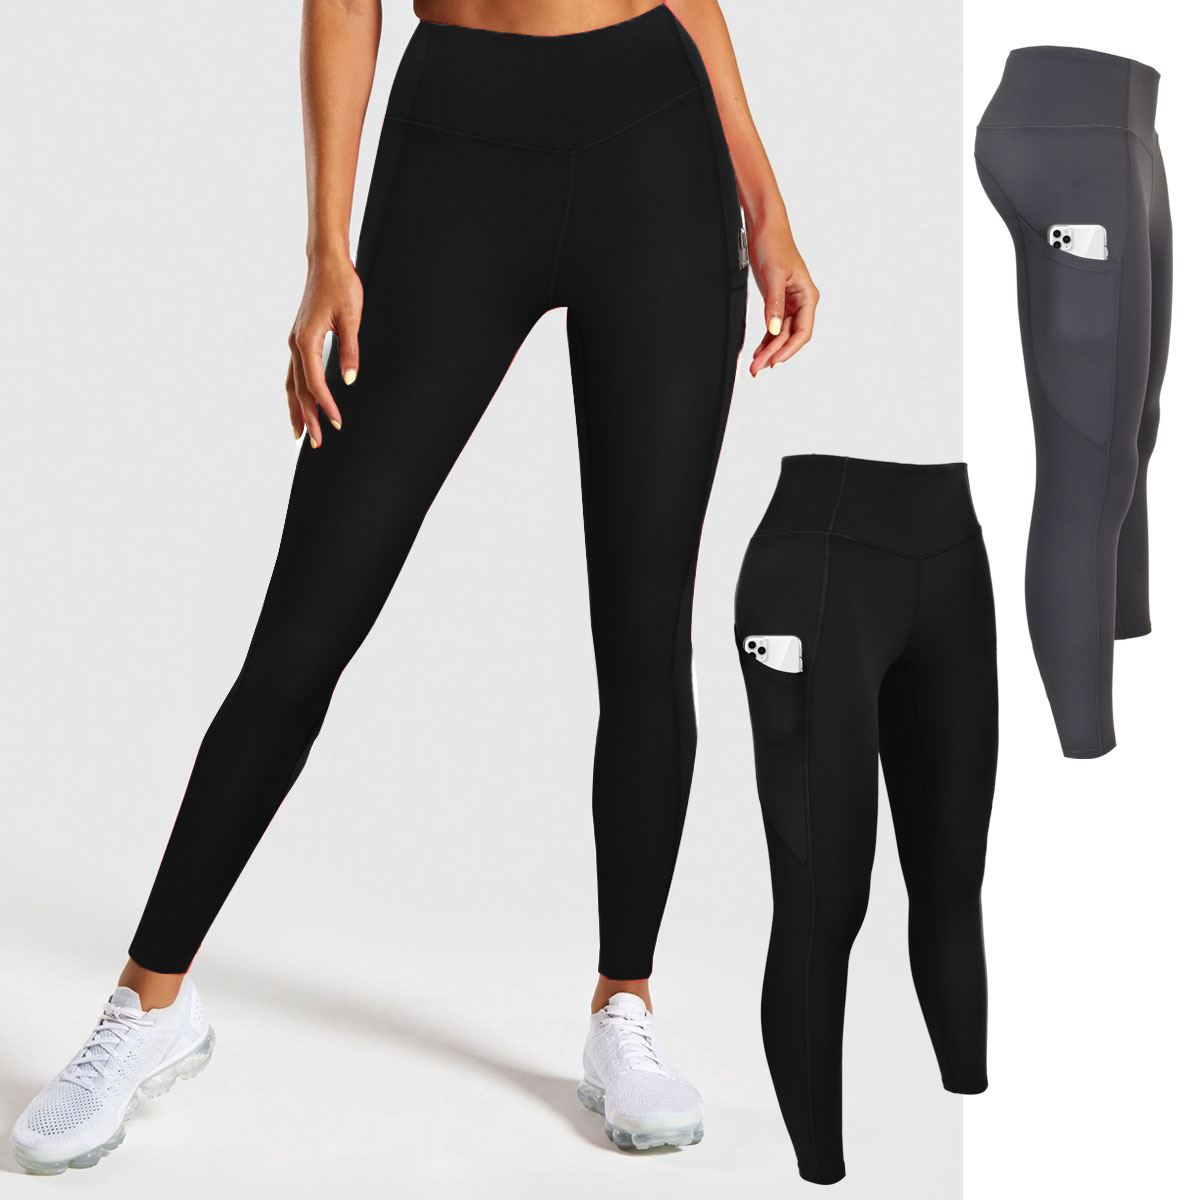 Womens High Thick Waisted Pocket Leggings Tummy Compression No Show Pants Yoga